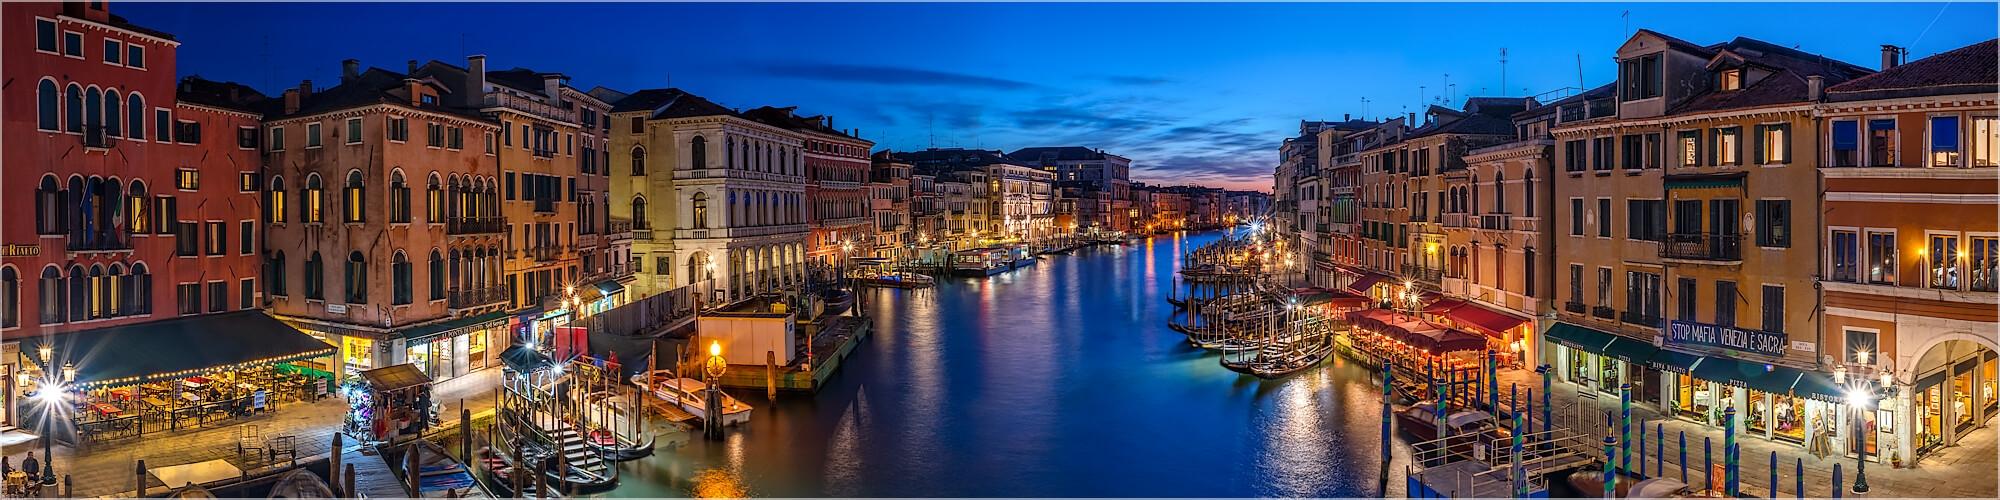 Panoramabild Canal Grande Rialto Brücke Venedig